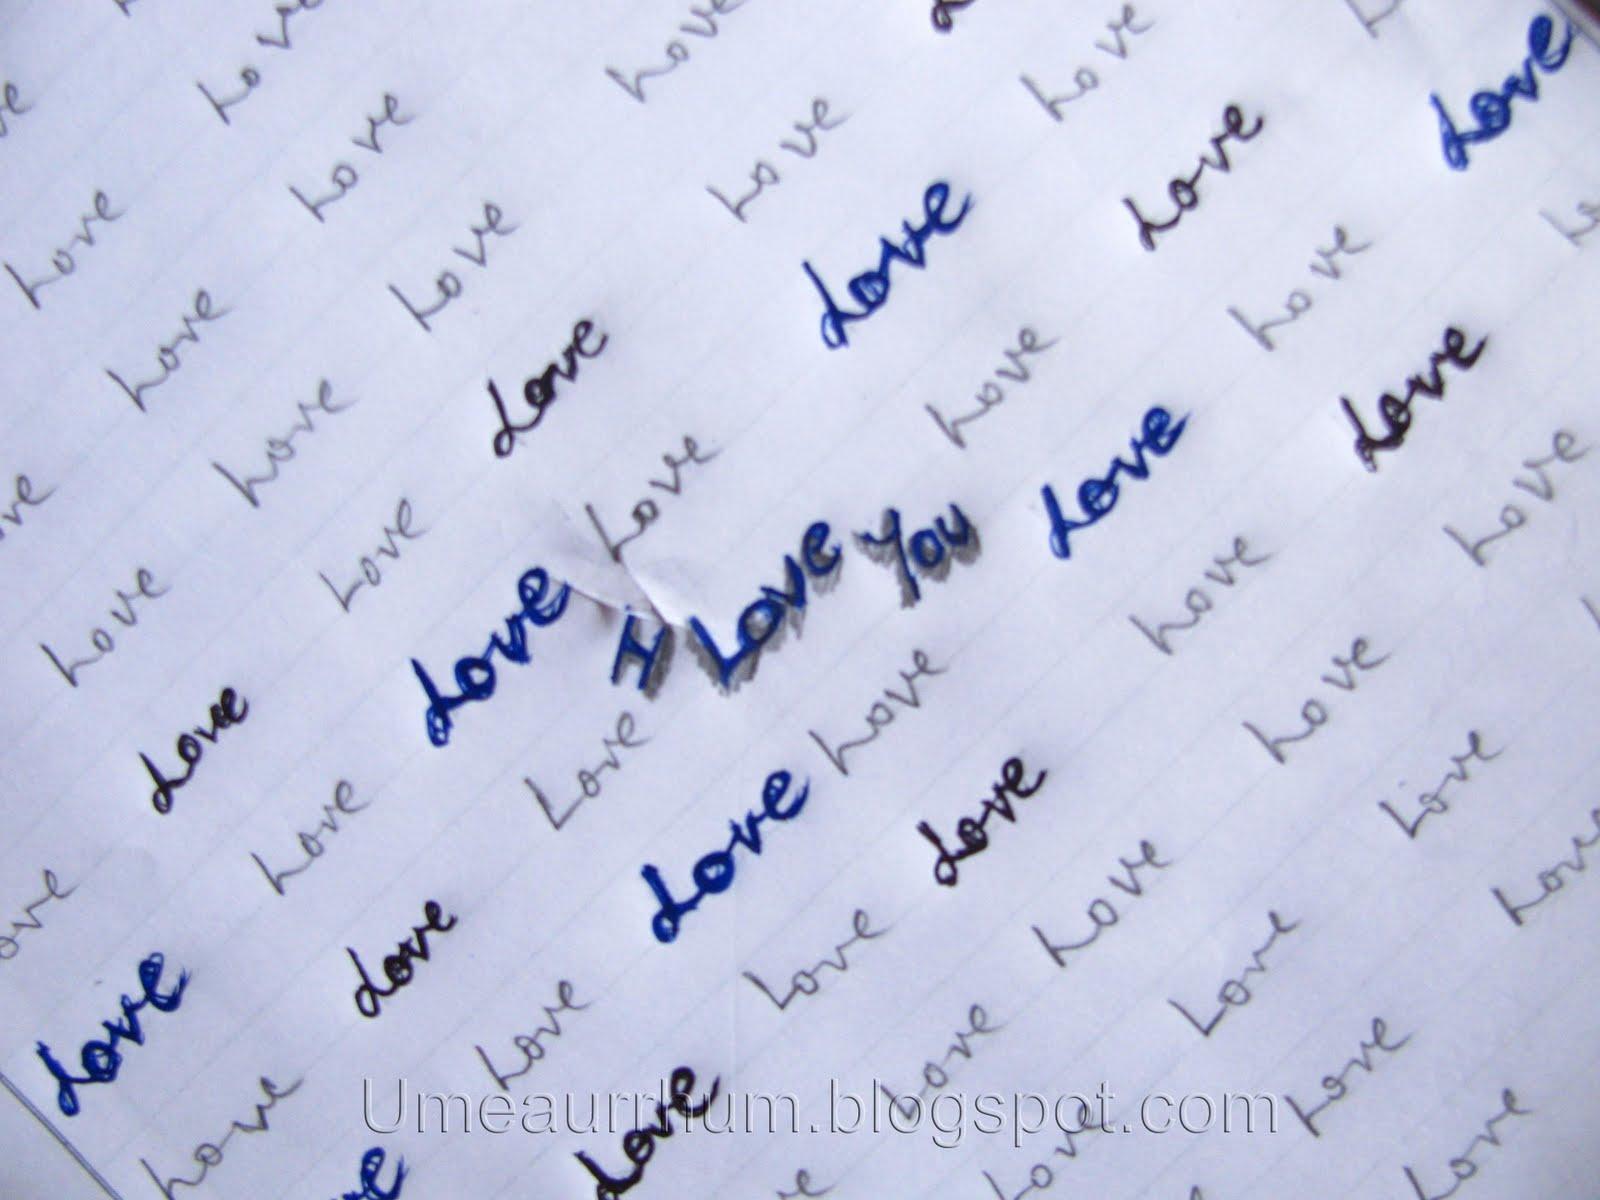 http://4.bp.blogspot.com/-oiC2qv_YiNQ/UBEgK9heDOI/AAAAAAAAIBg/7a3ZkO4ILK0/s1600/sad%20love%20alone%20miss%20u%20love%20u%20quotes%20wallpapers%20(7).jpg